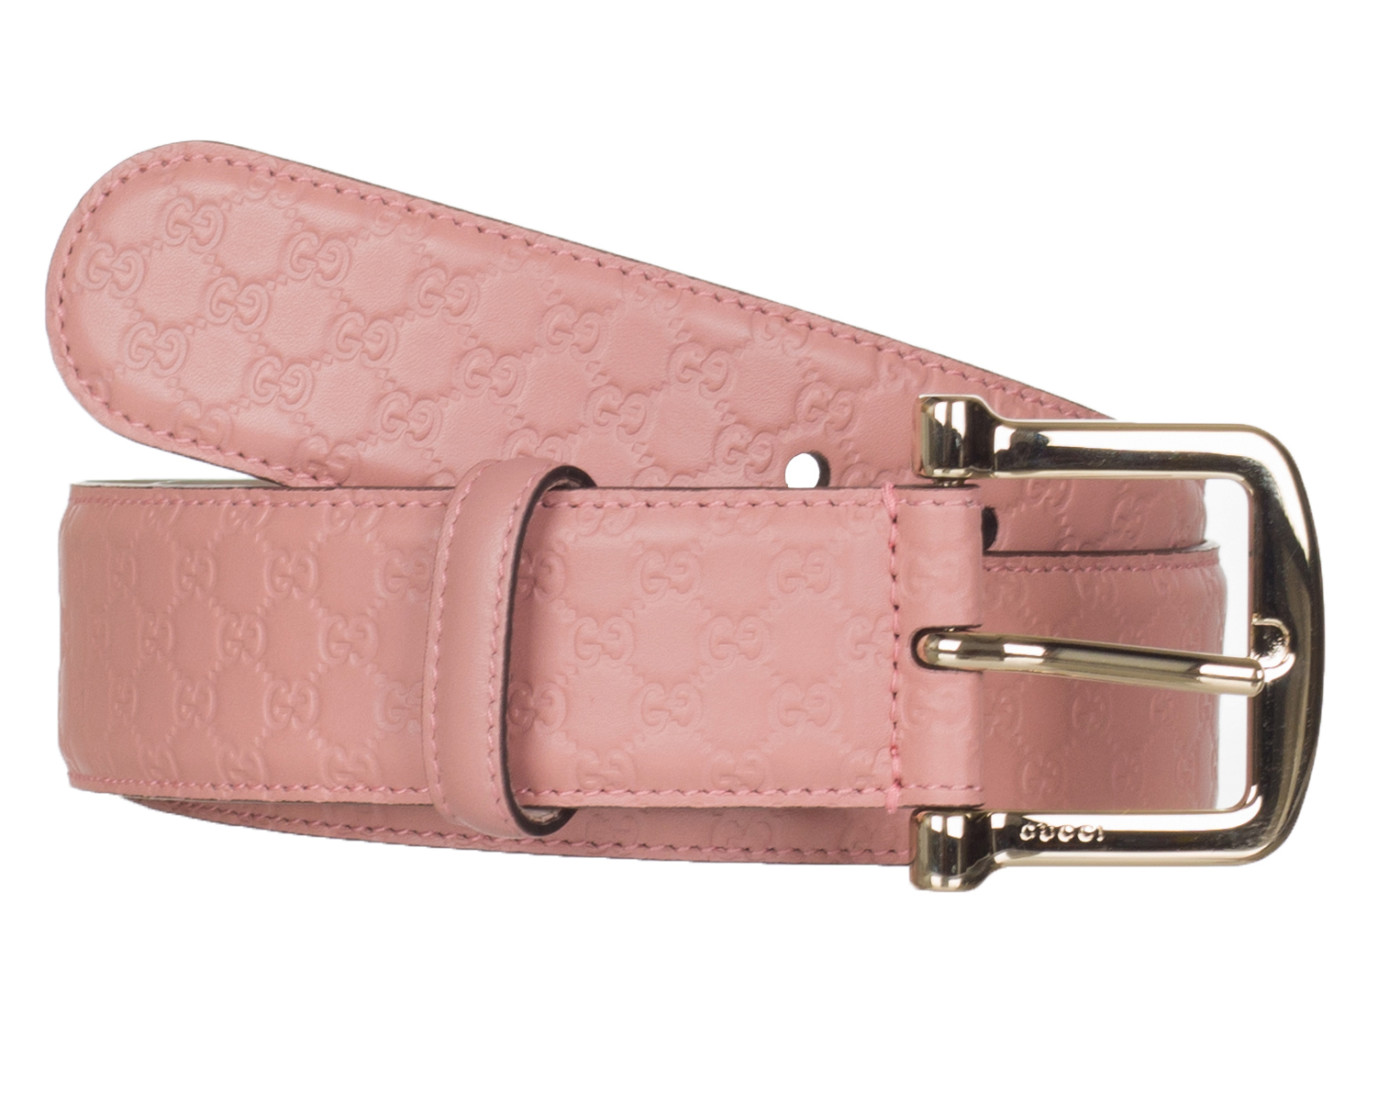 b39cc422 Gucci Women's Pink Leather GG Microguccissima Buckle Belt